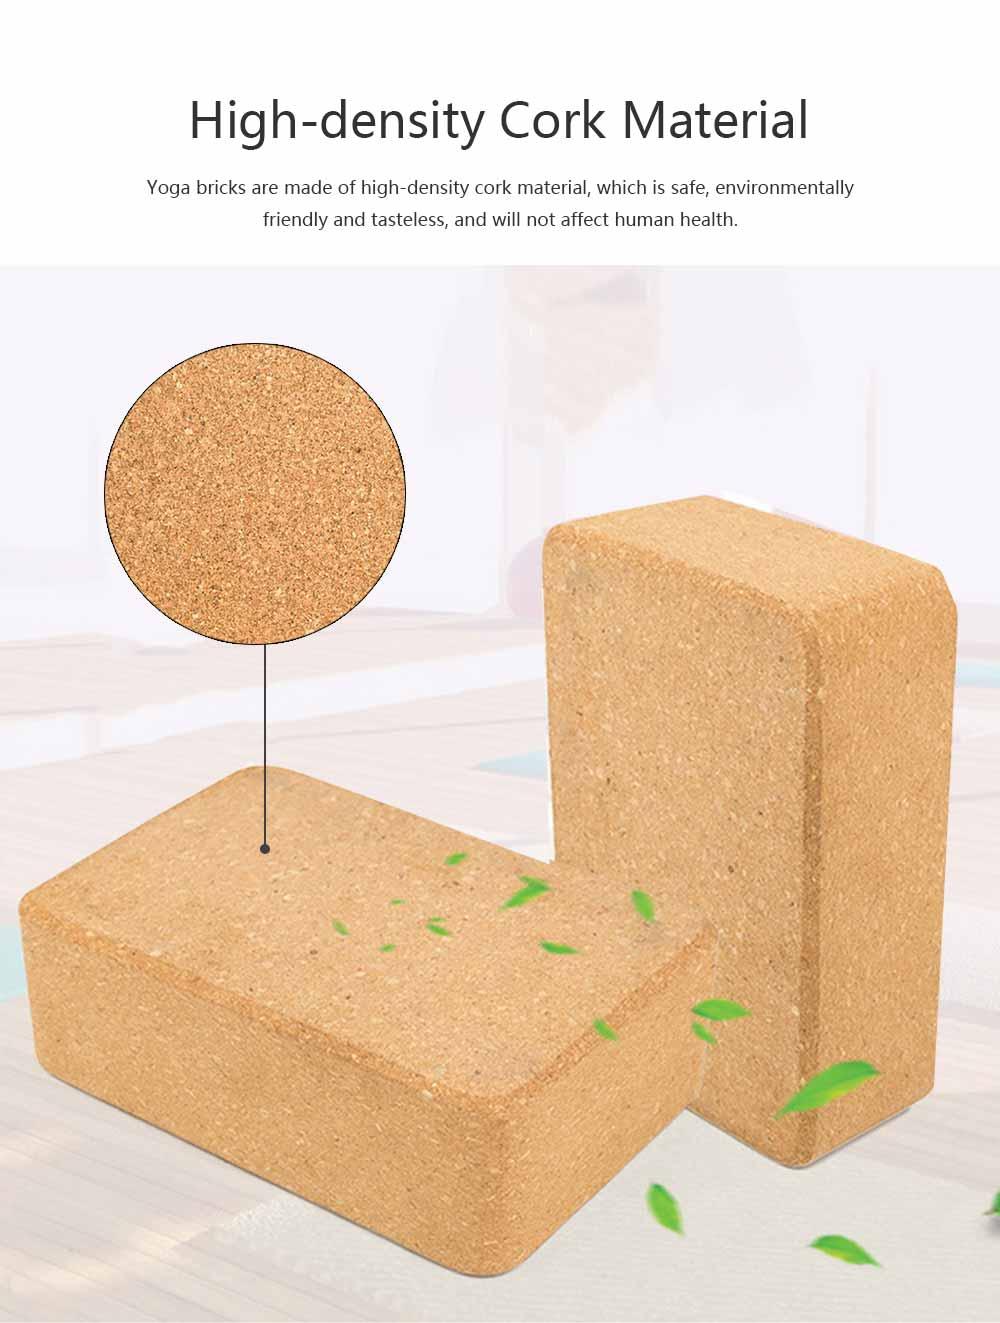 Cork Yoga Brick EVA Non-slip Training Tile Assist for Practitioners Fitness Environment Massage Yoga Block 1